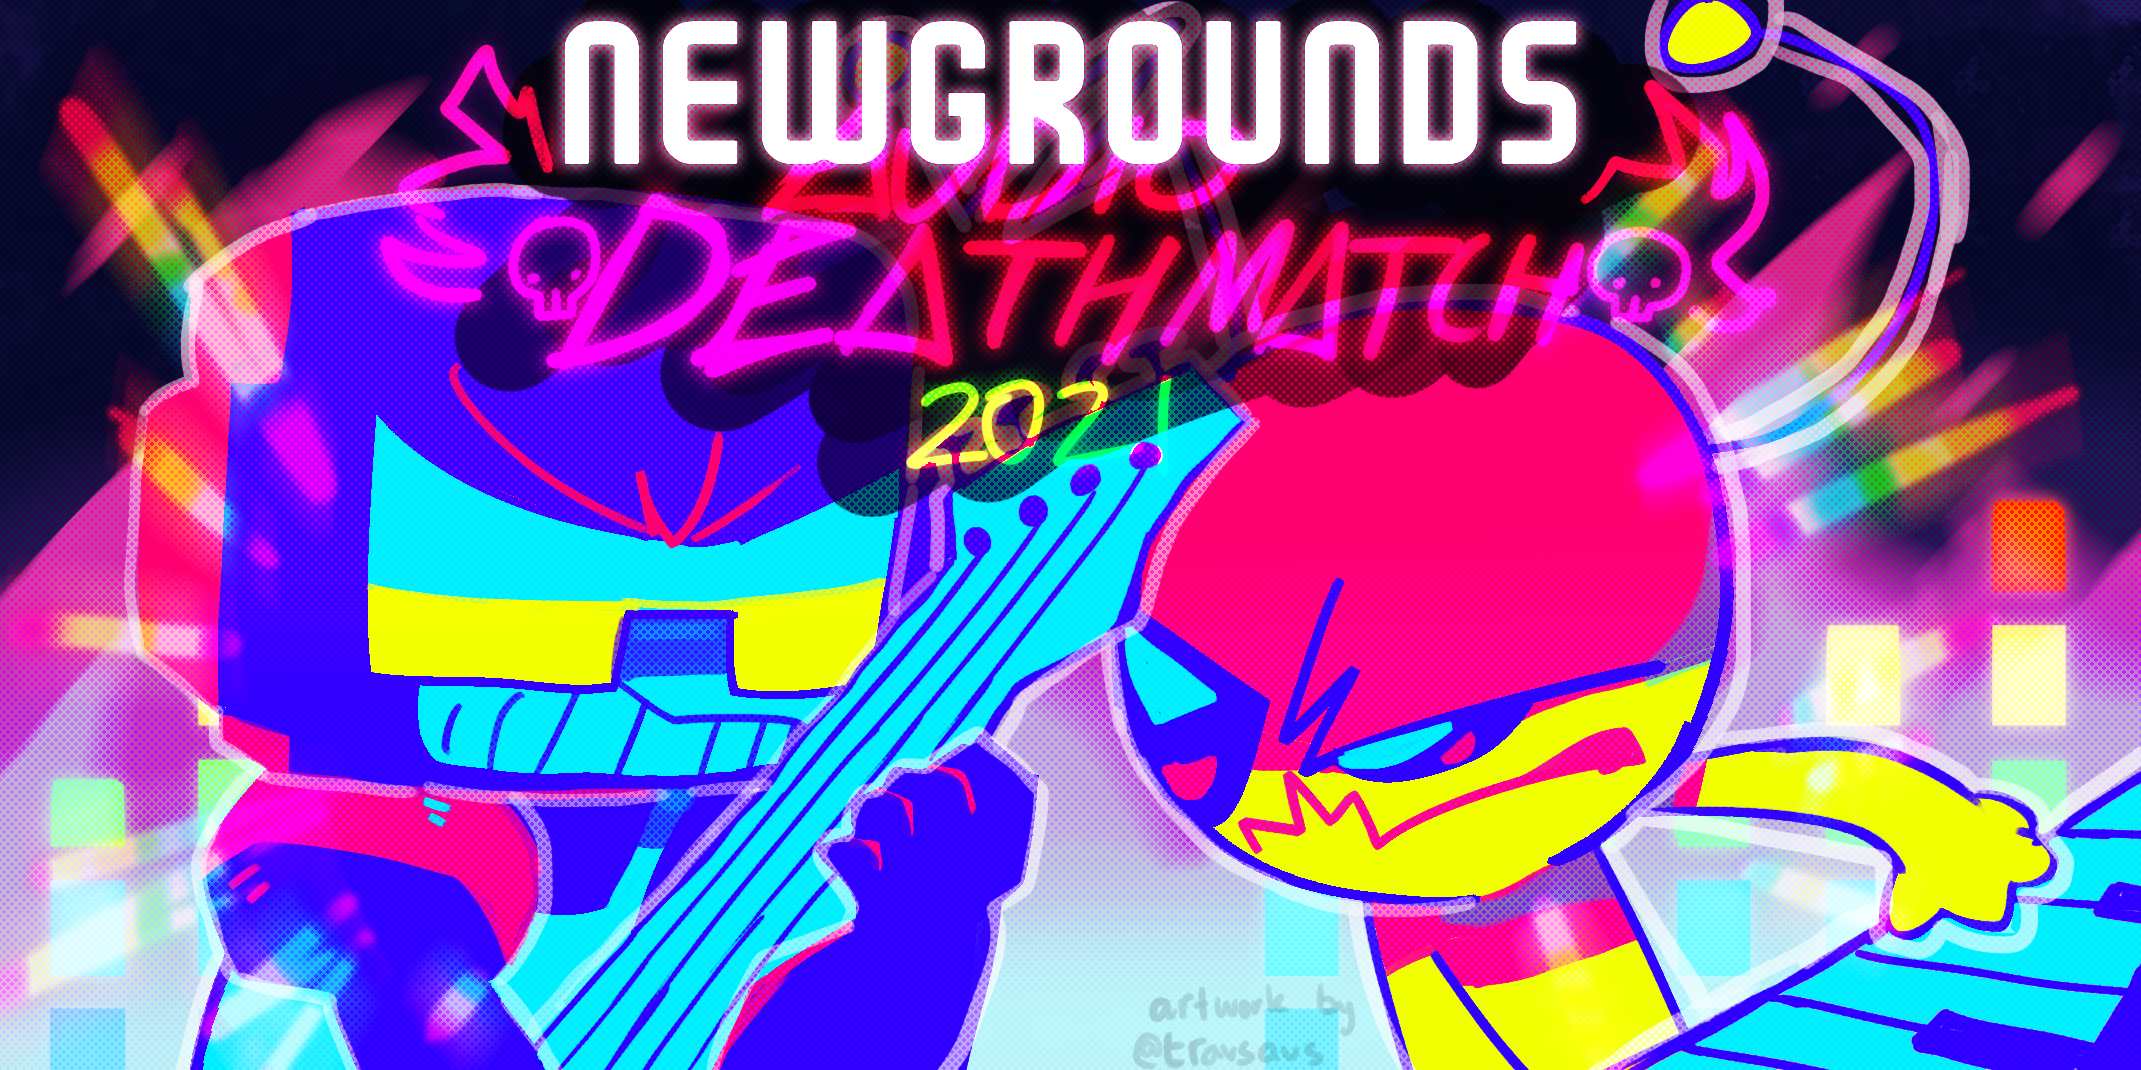 NG Audio Deathmatch 2021 Artwork